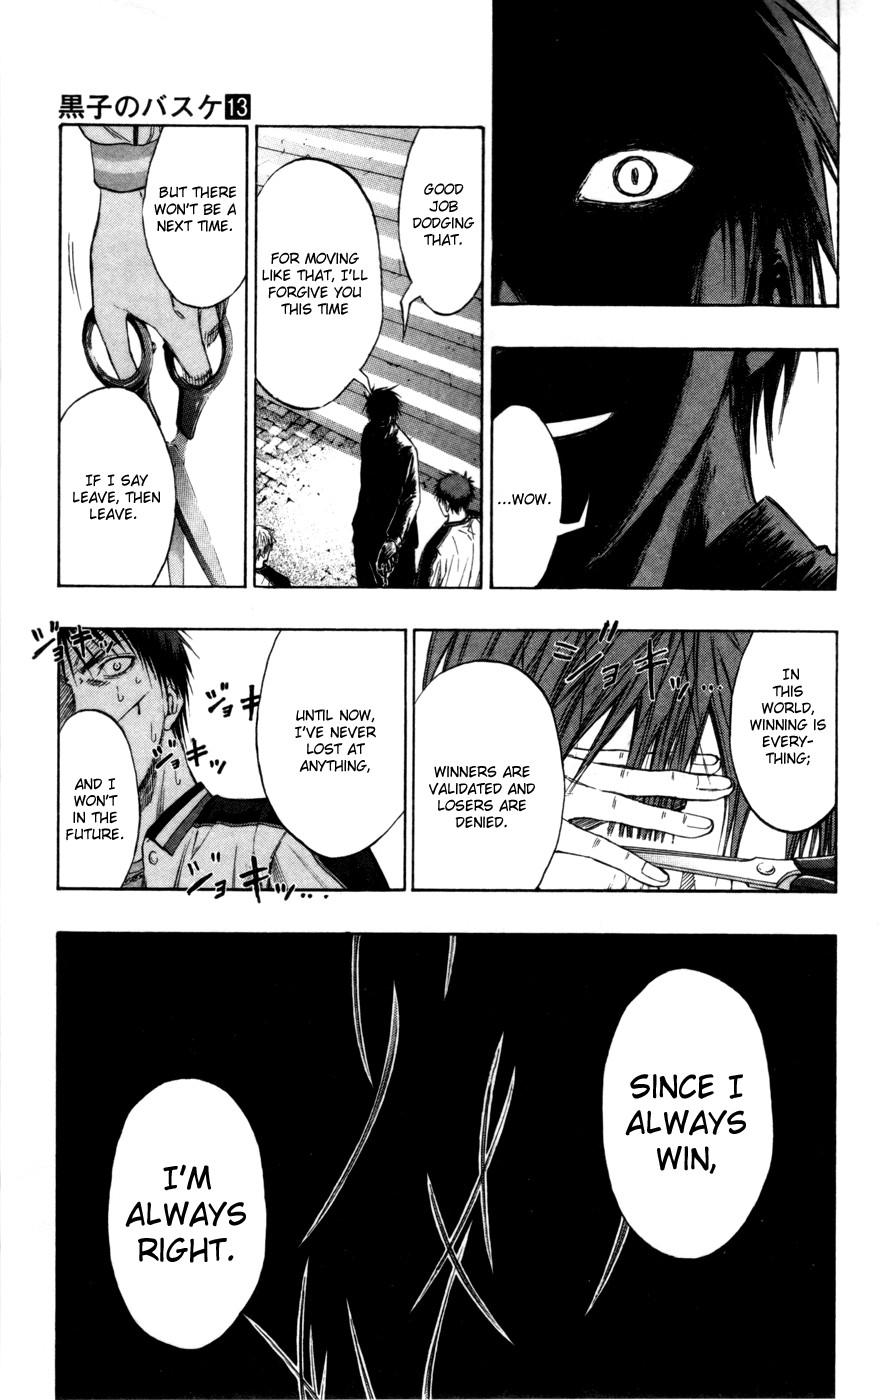 Kuroko no Basket Manga Chapter 113 - Image 16